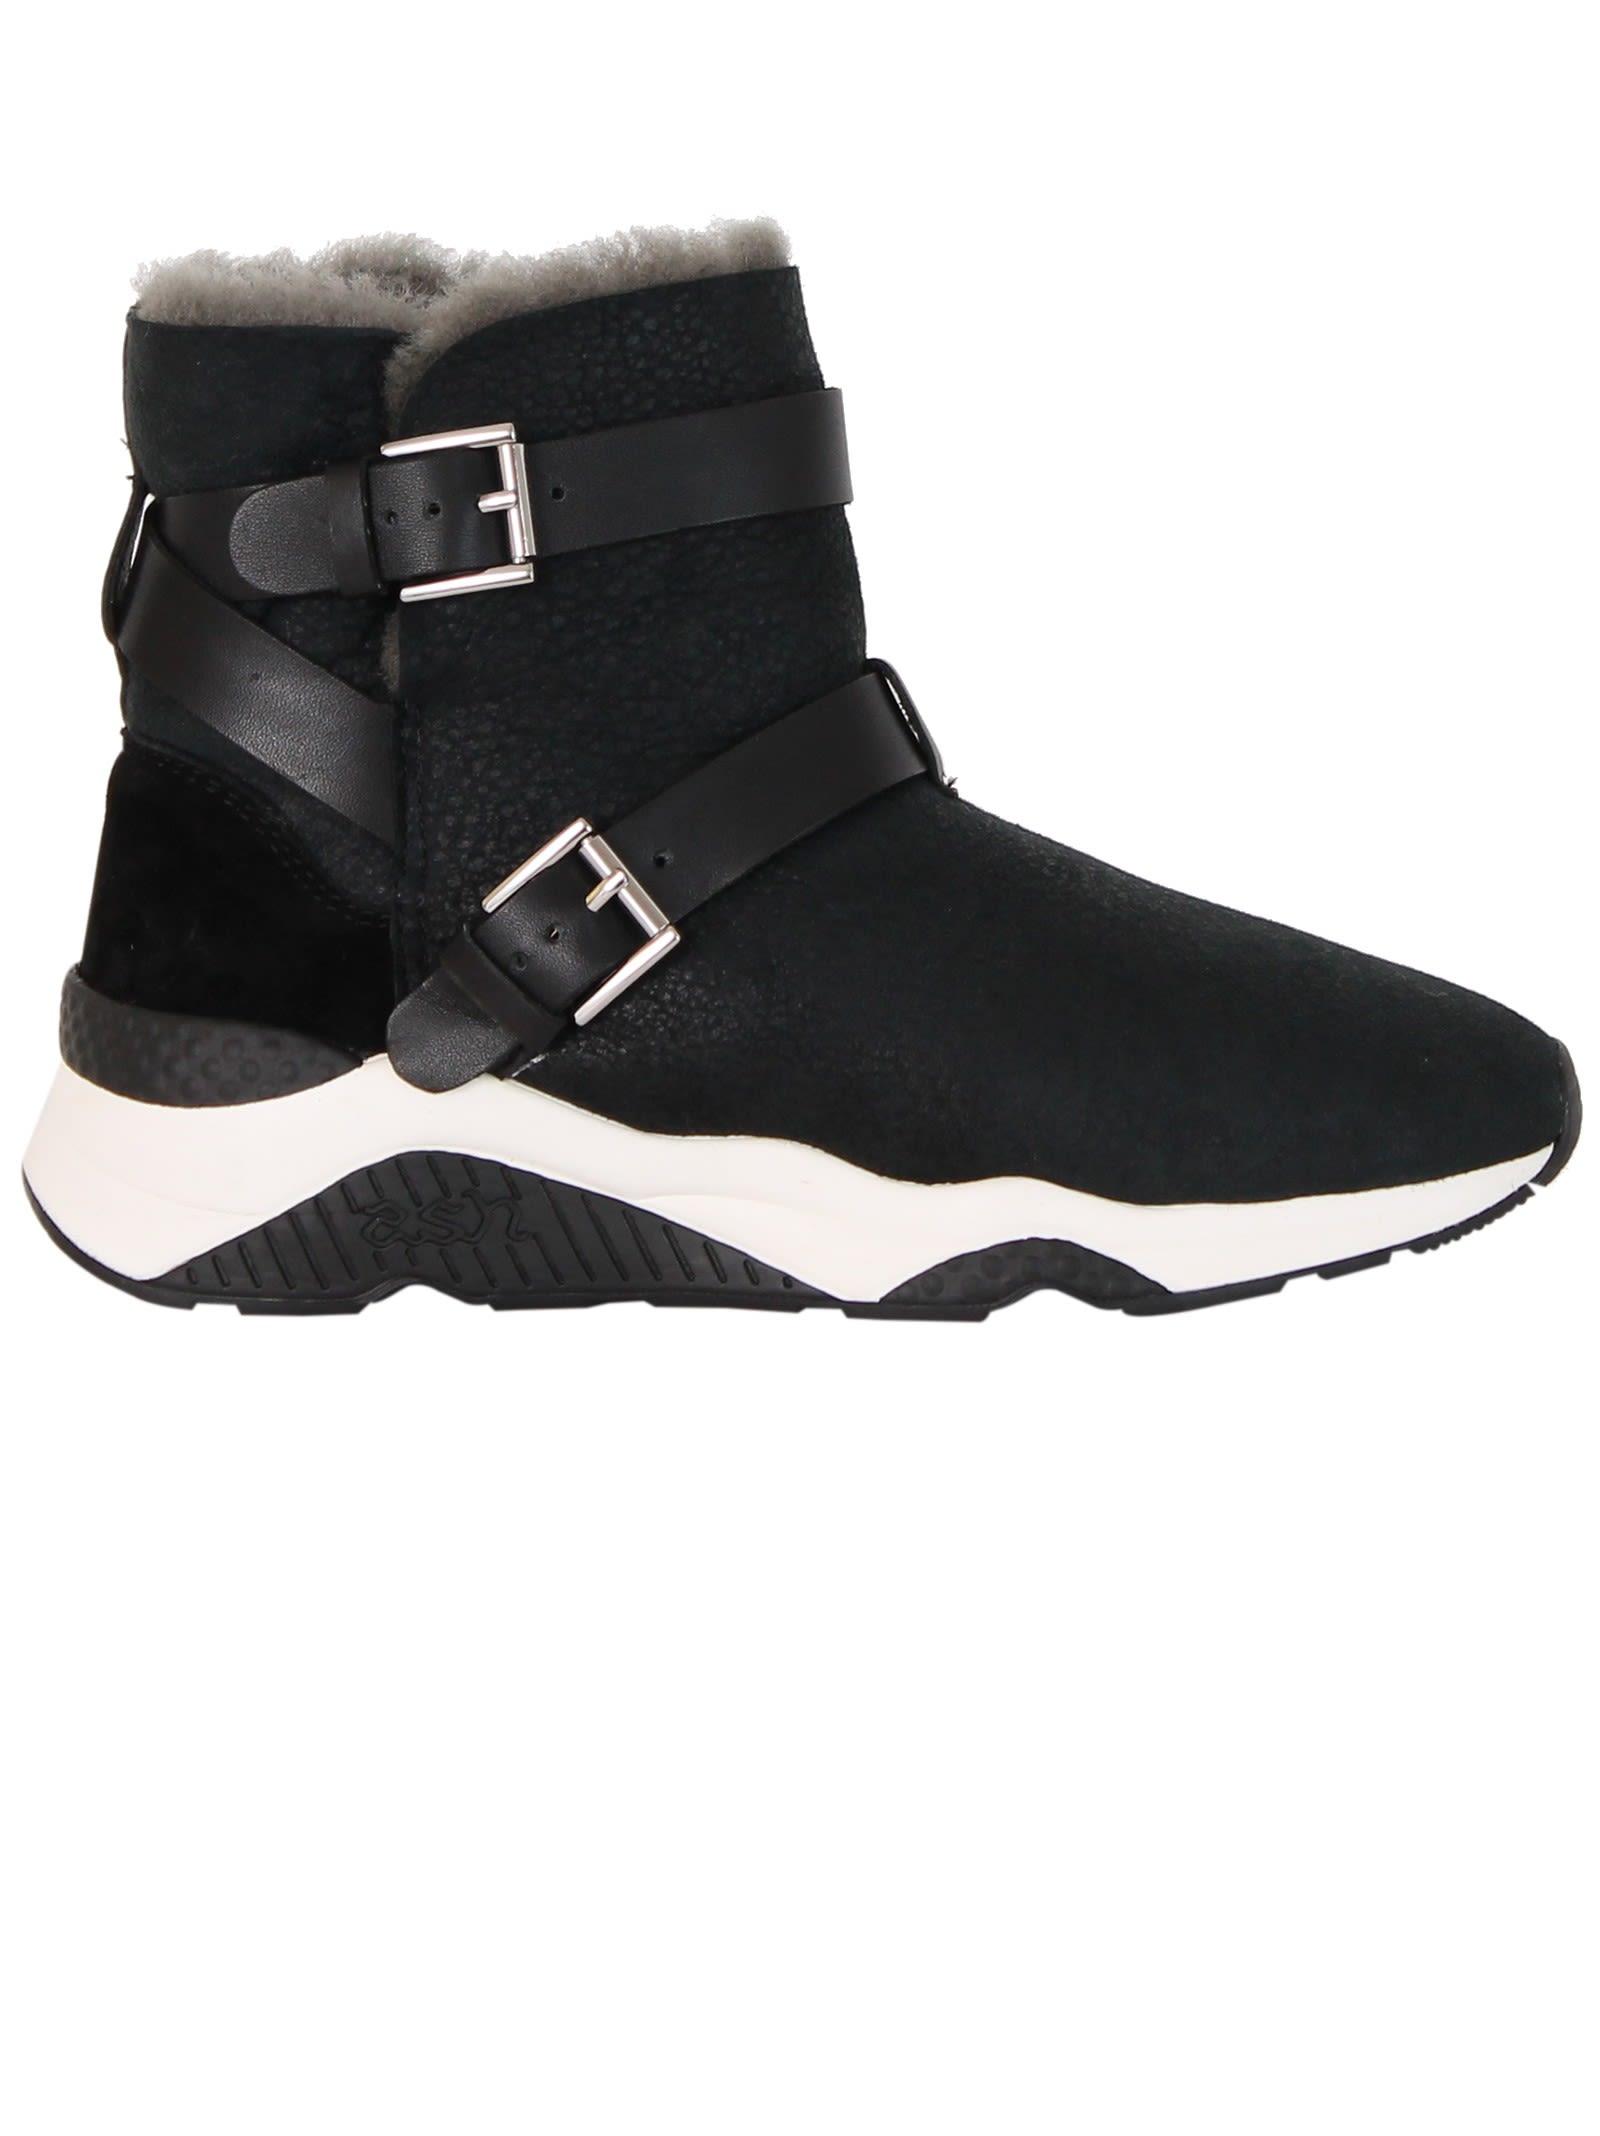 Discount Amazing Price 2018 Unisex Sale Online Ash Mochi Buckle Boots Explore Online ORLvaDQlV